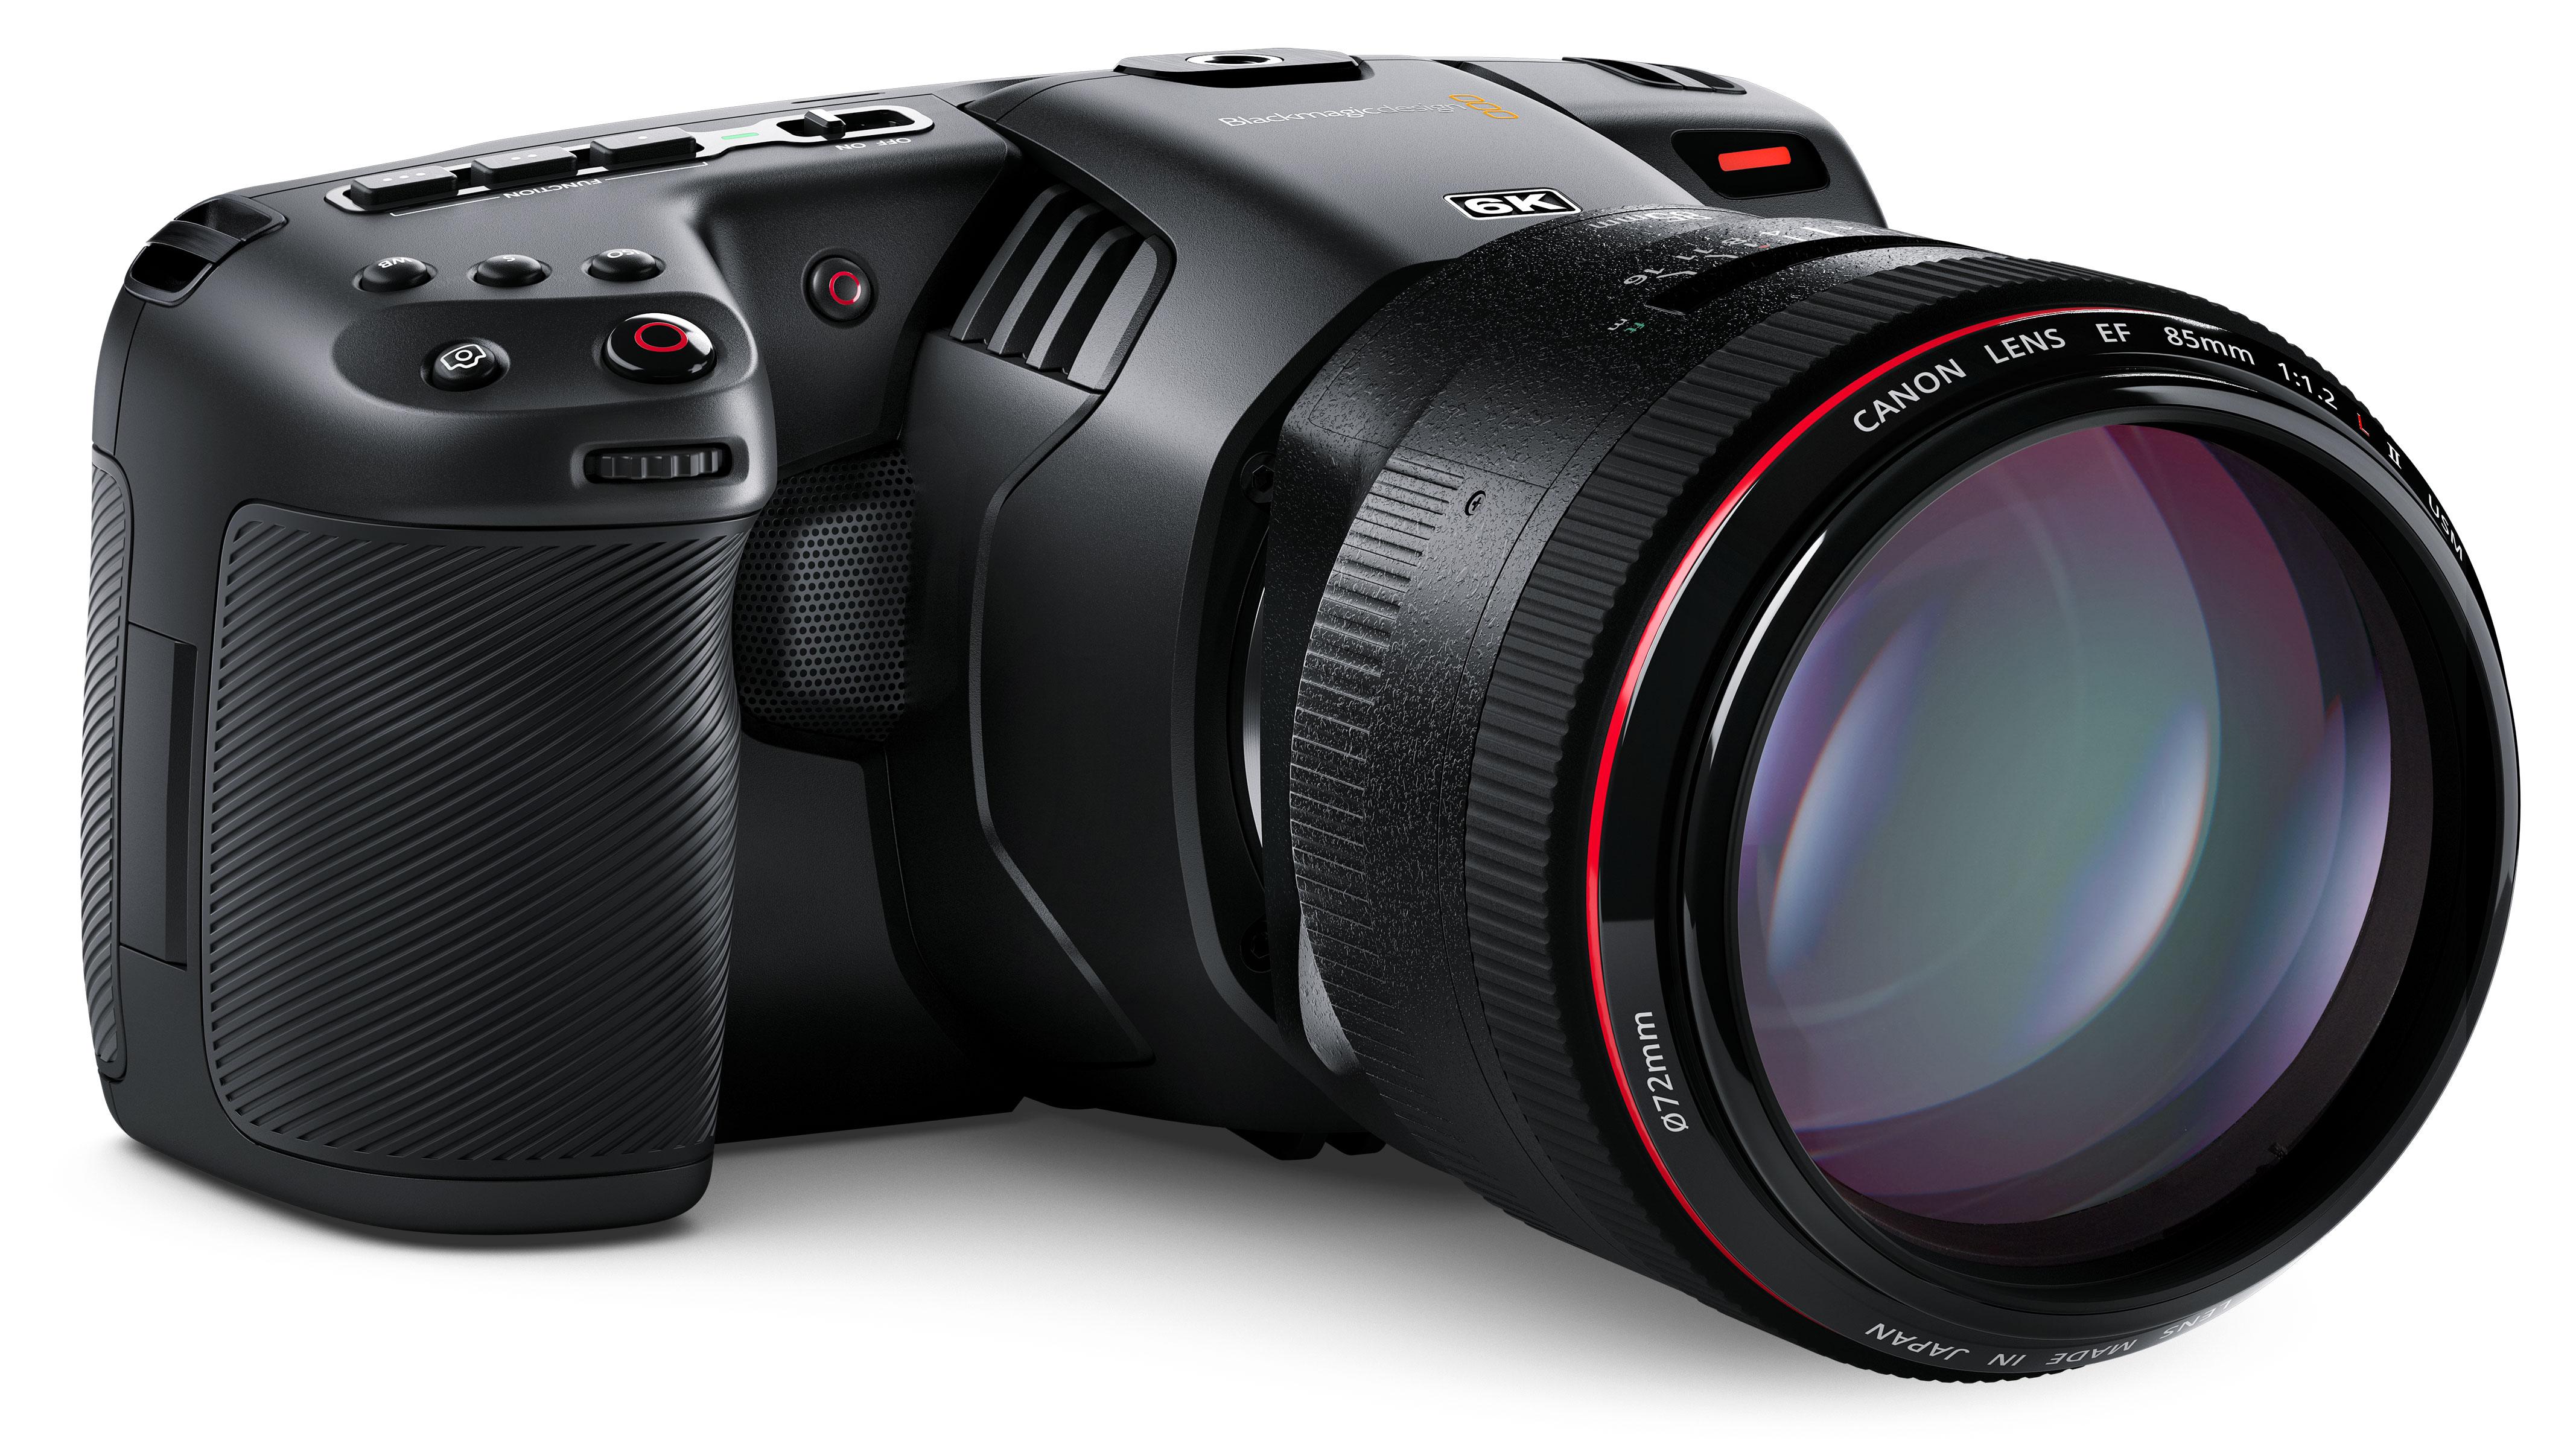 Blackmagic Pocket Cinema Camera 6K raises the bar for video resolution   Digital Camera World